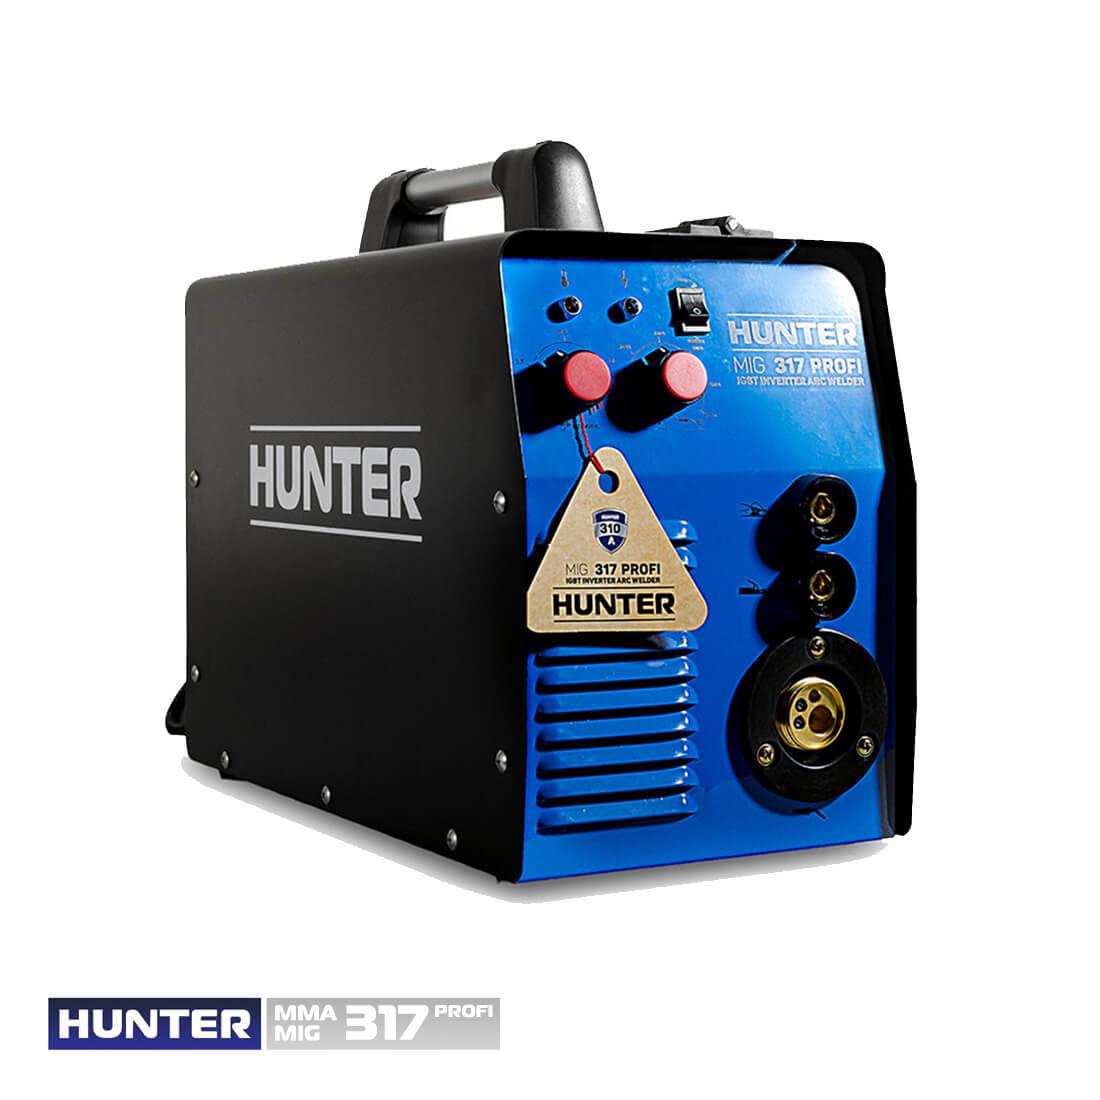 Фото Hunter MIG/MMA 317 (напівавт.+дуговий) цена 6075грн №4 — Hunter